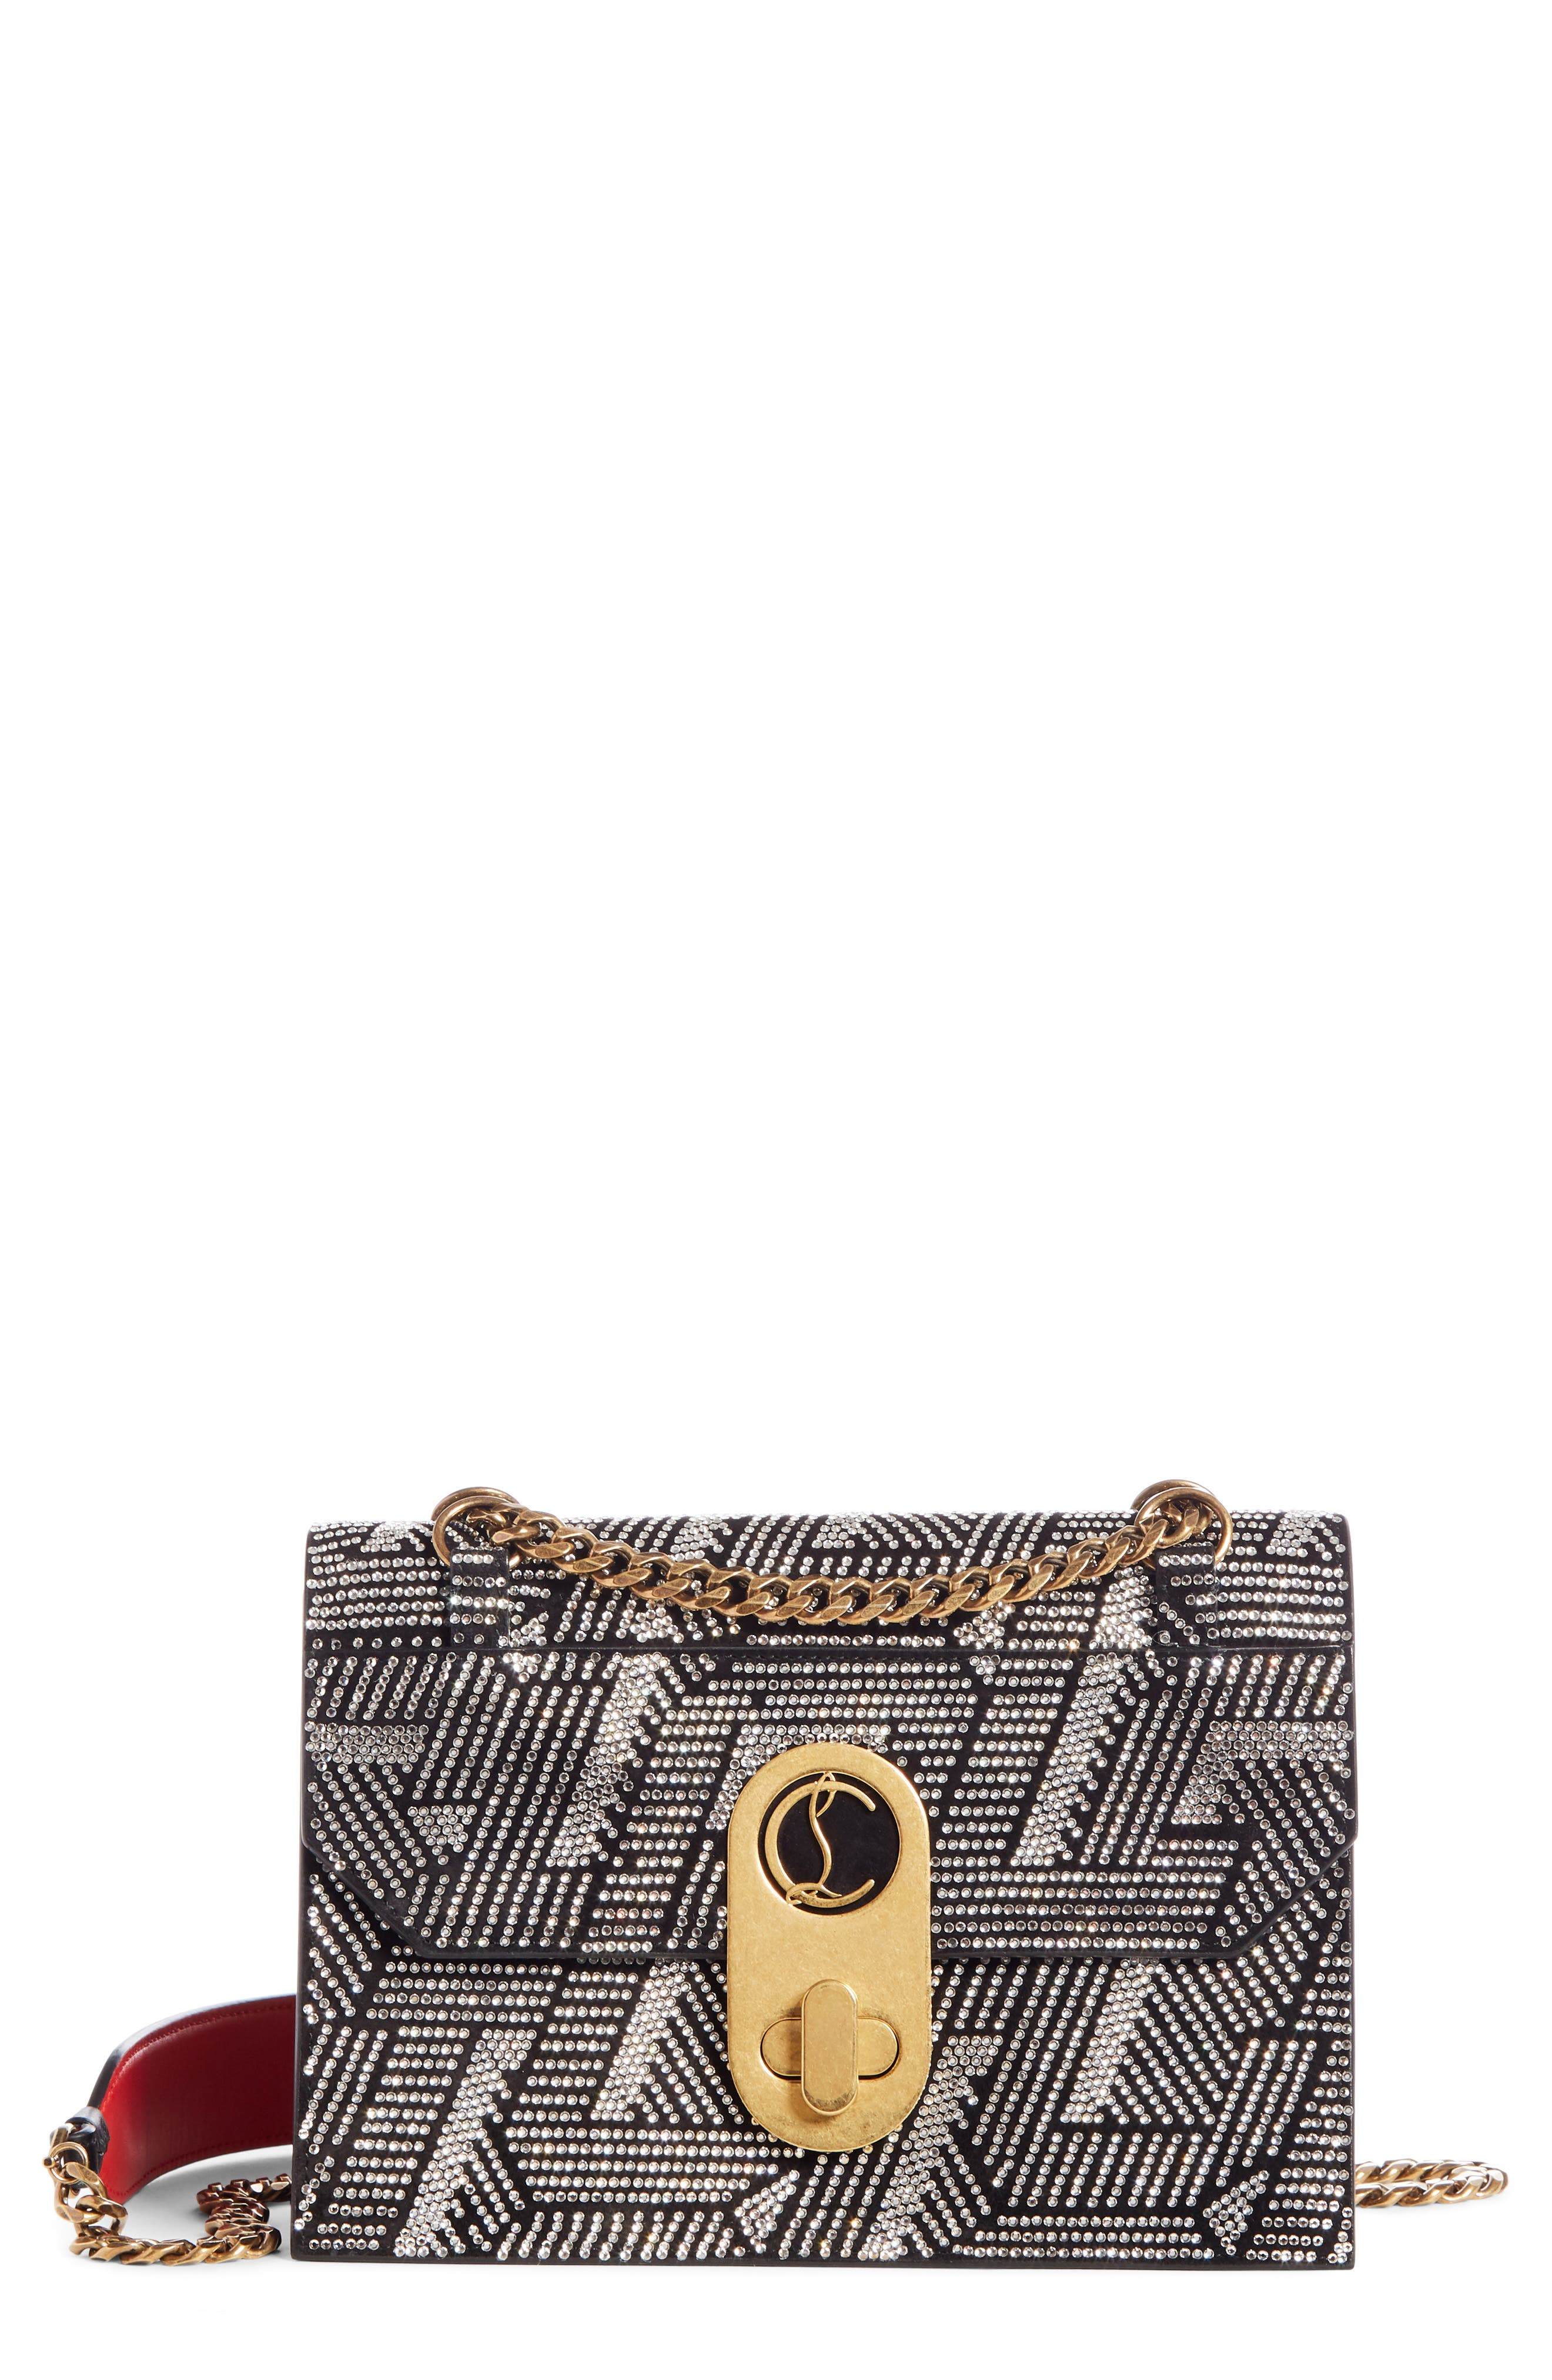 Christian Louboutin Small Elisa Embellished Leather Crossbody Bag   Nordstrom